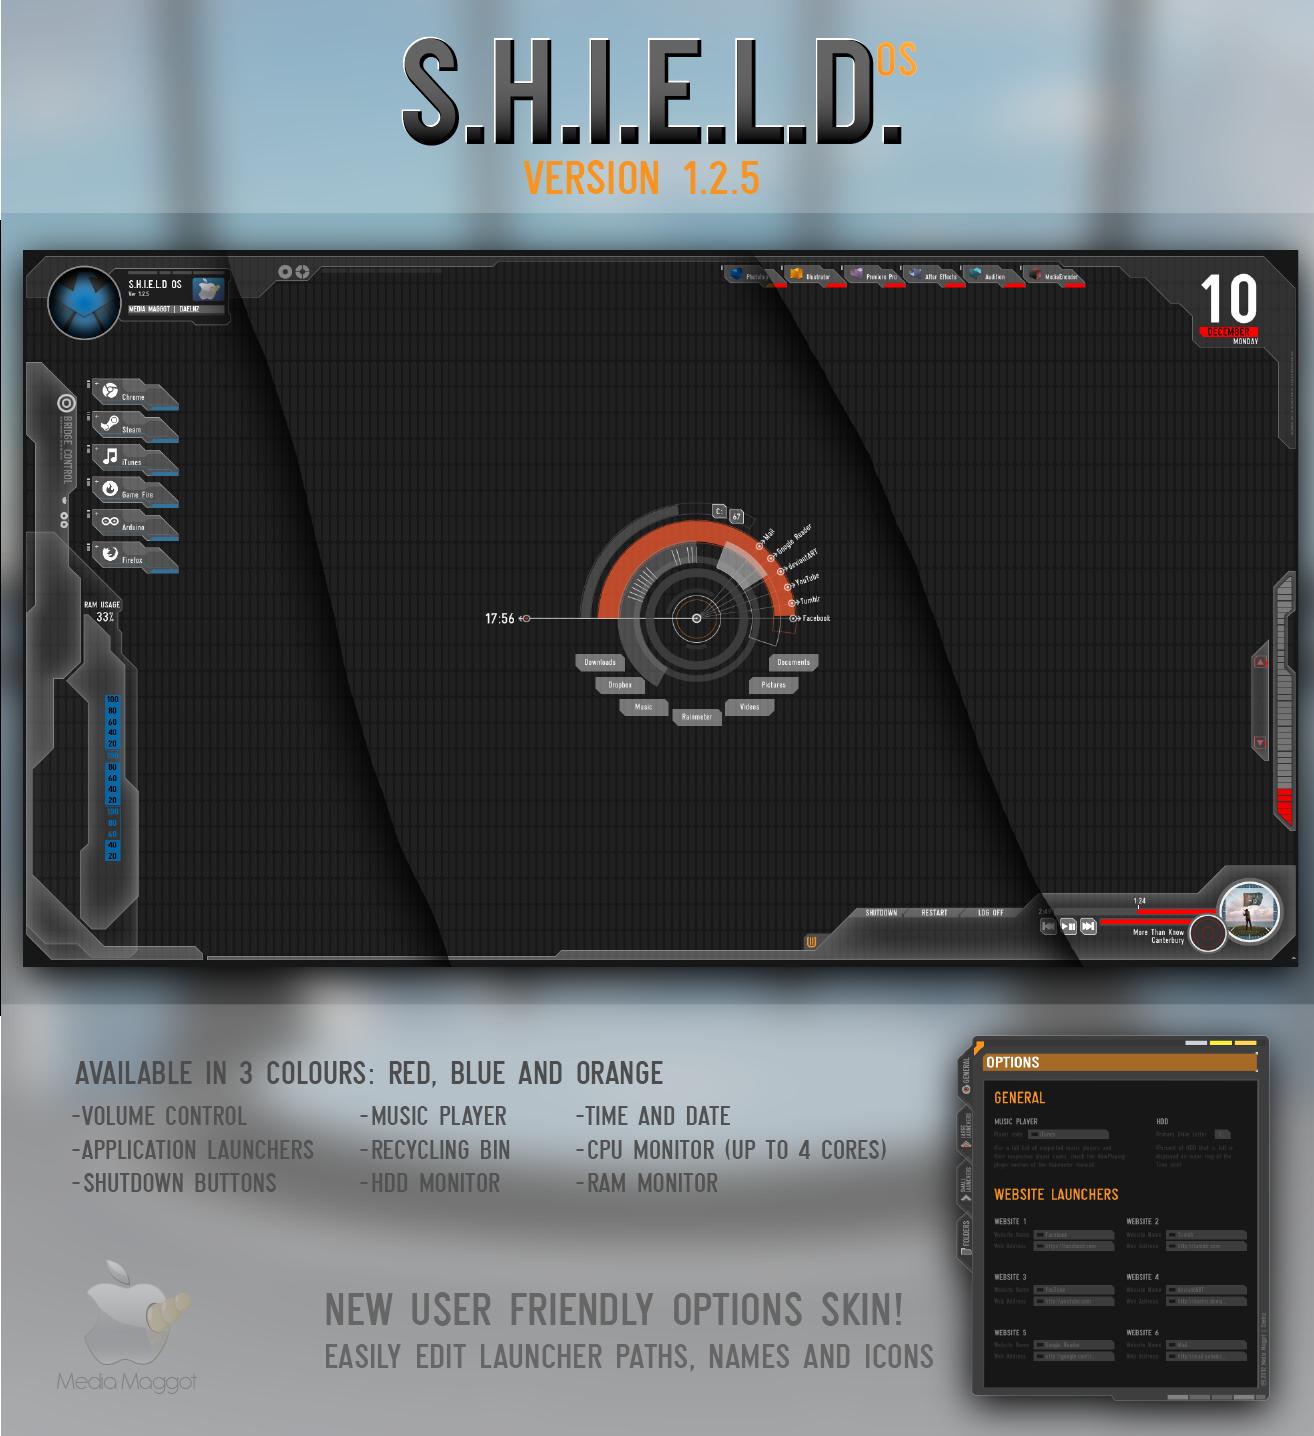 Avengers S.H.I.E.L.D OS Ver 1.2.5 by Daelnz